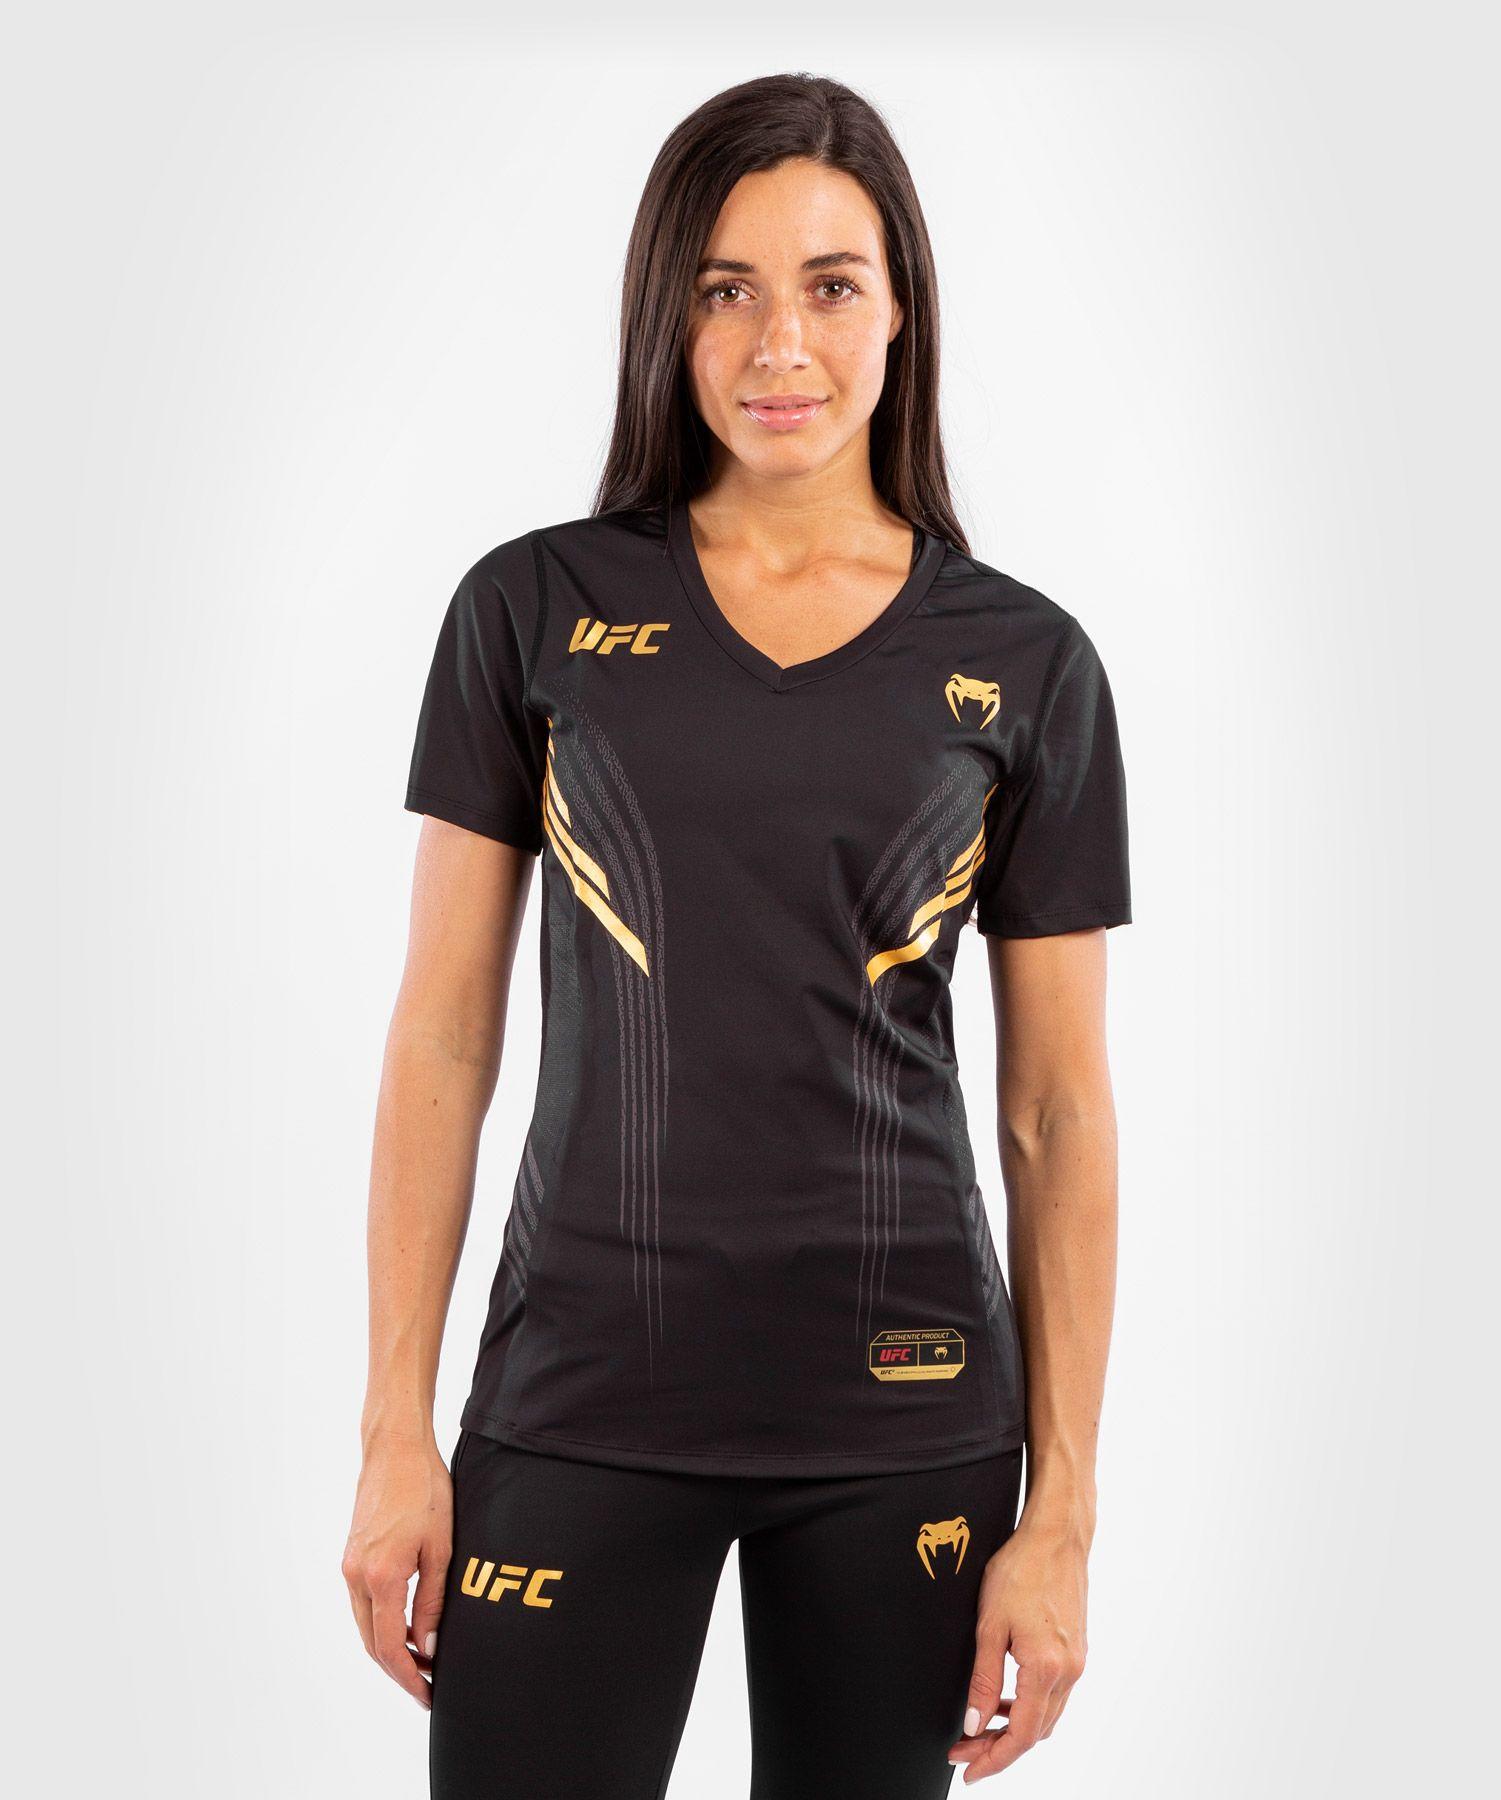 UFC Venum Authentic Fight Night Women's Walkout Jersey - Champion